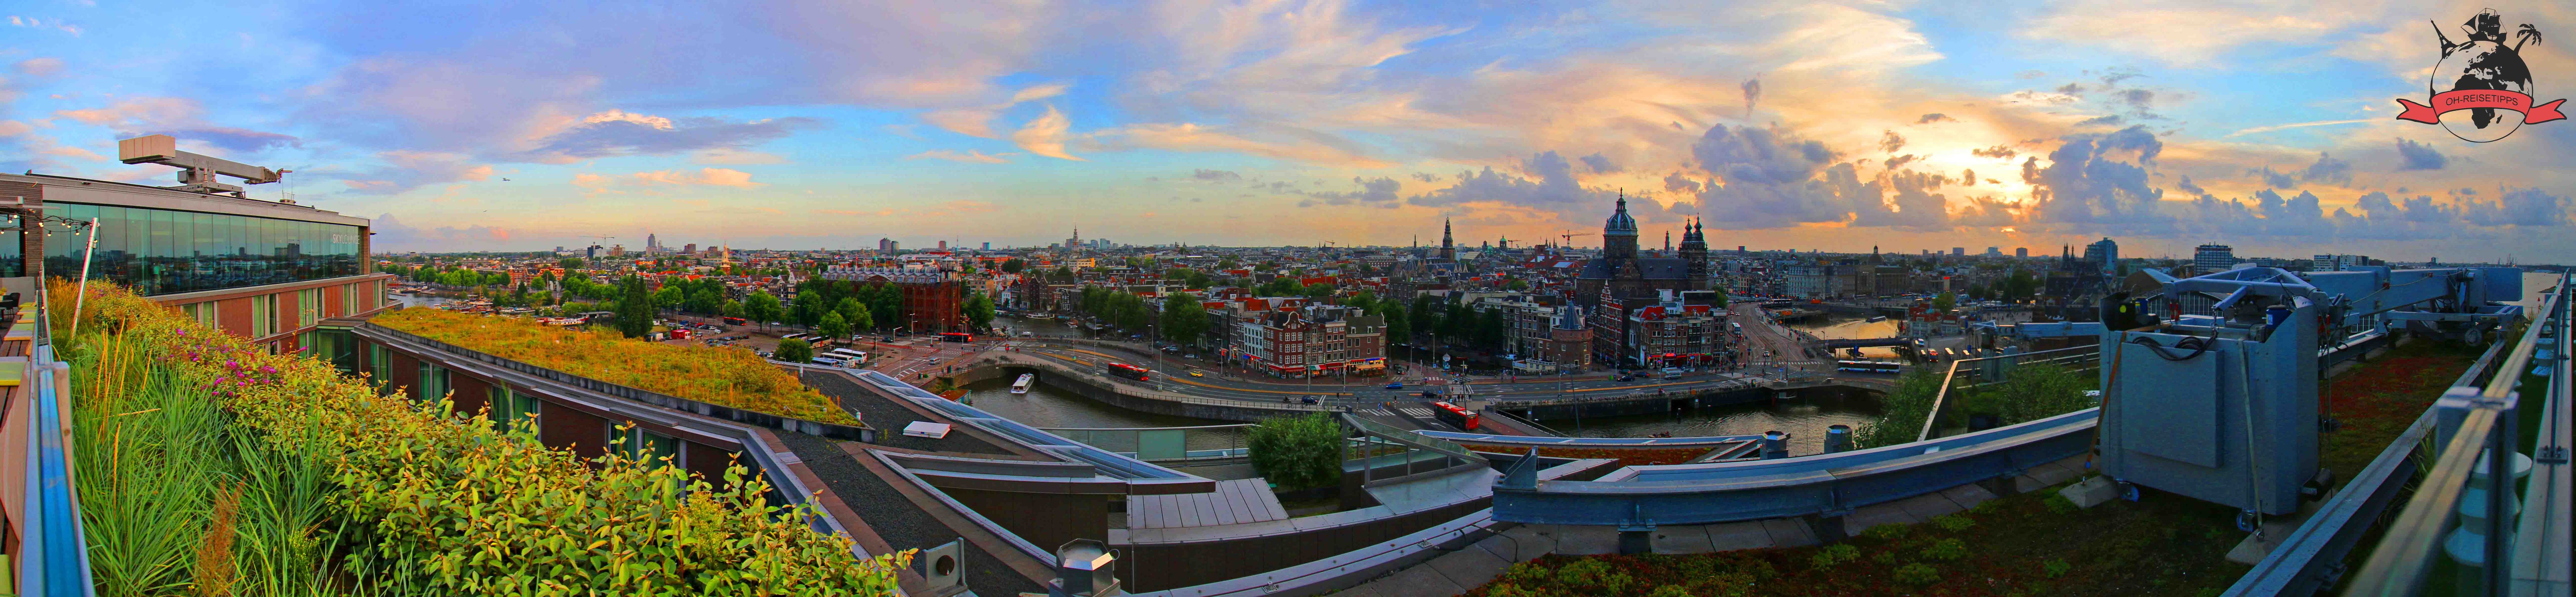 niederlande-amsterdam-hiltonhotel-stadt